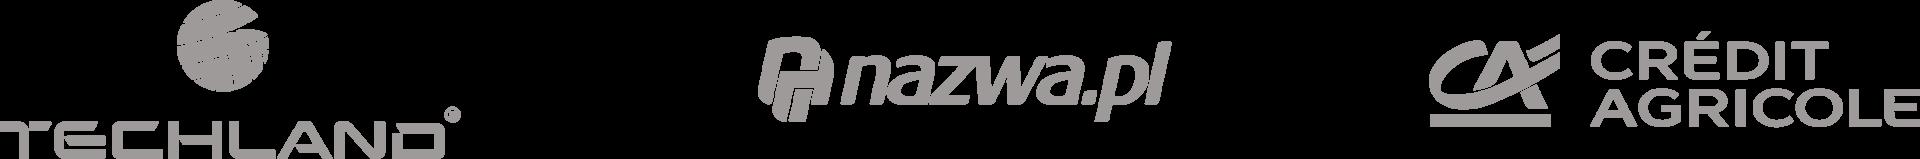 Clients - Verizon, MRY, Ogilvy, Unilever